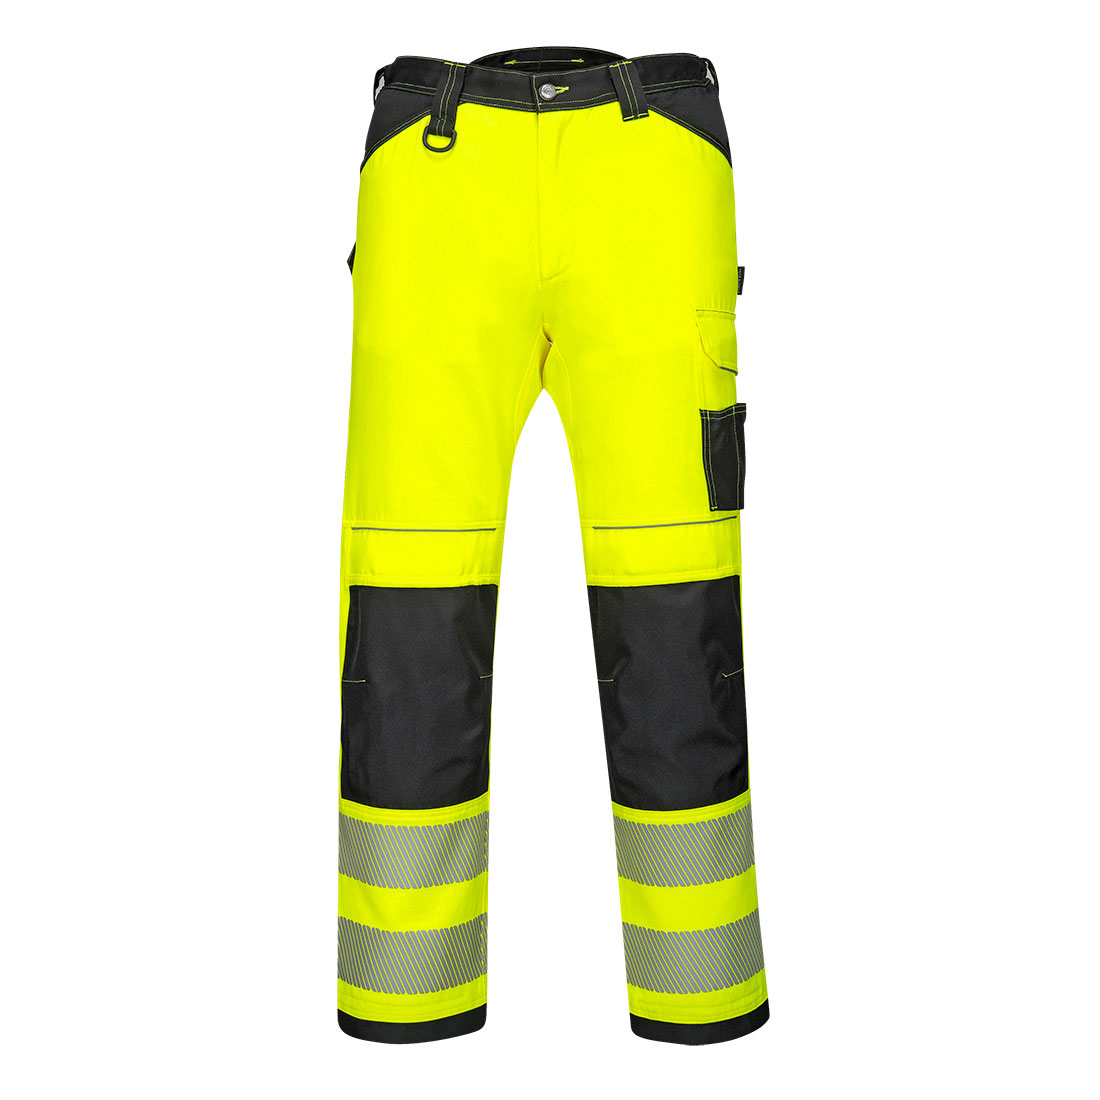 PW3 Hi-Vis Work Trousers Yellow/Black 34S